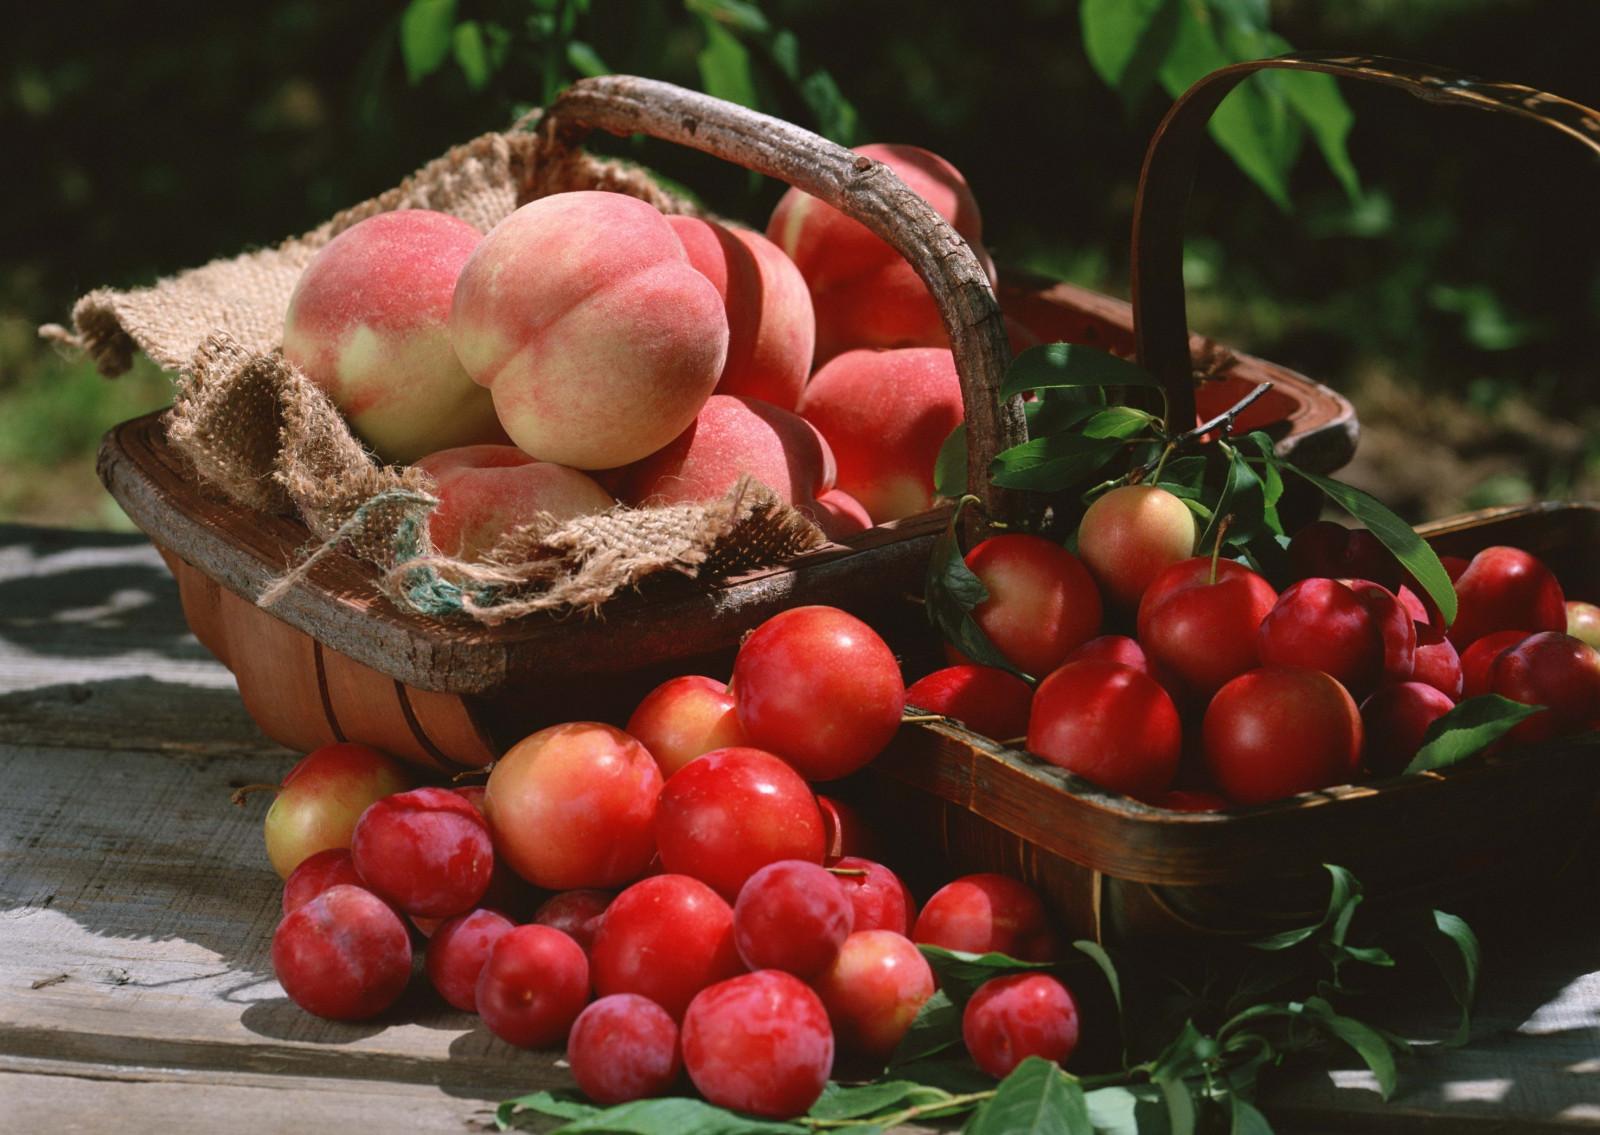 hintergrundbilder lebensmittel rot frucht pfirsich korb apfel blume ernte pflaume. Black Bedroom Furniture Sets. Home Design Ideas